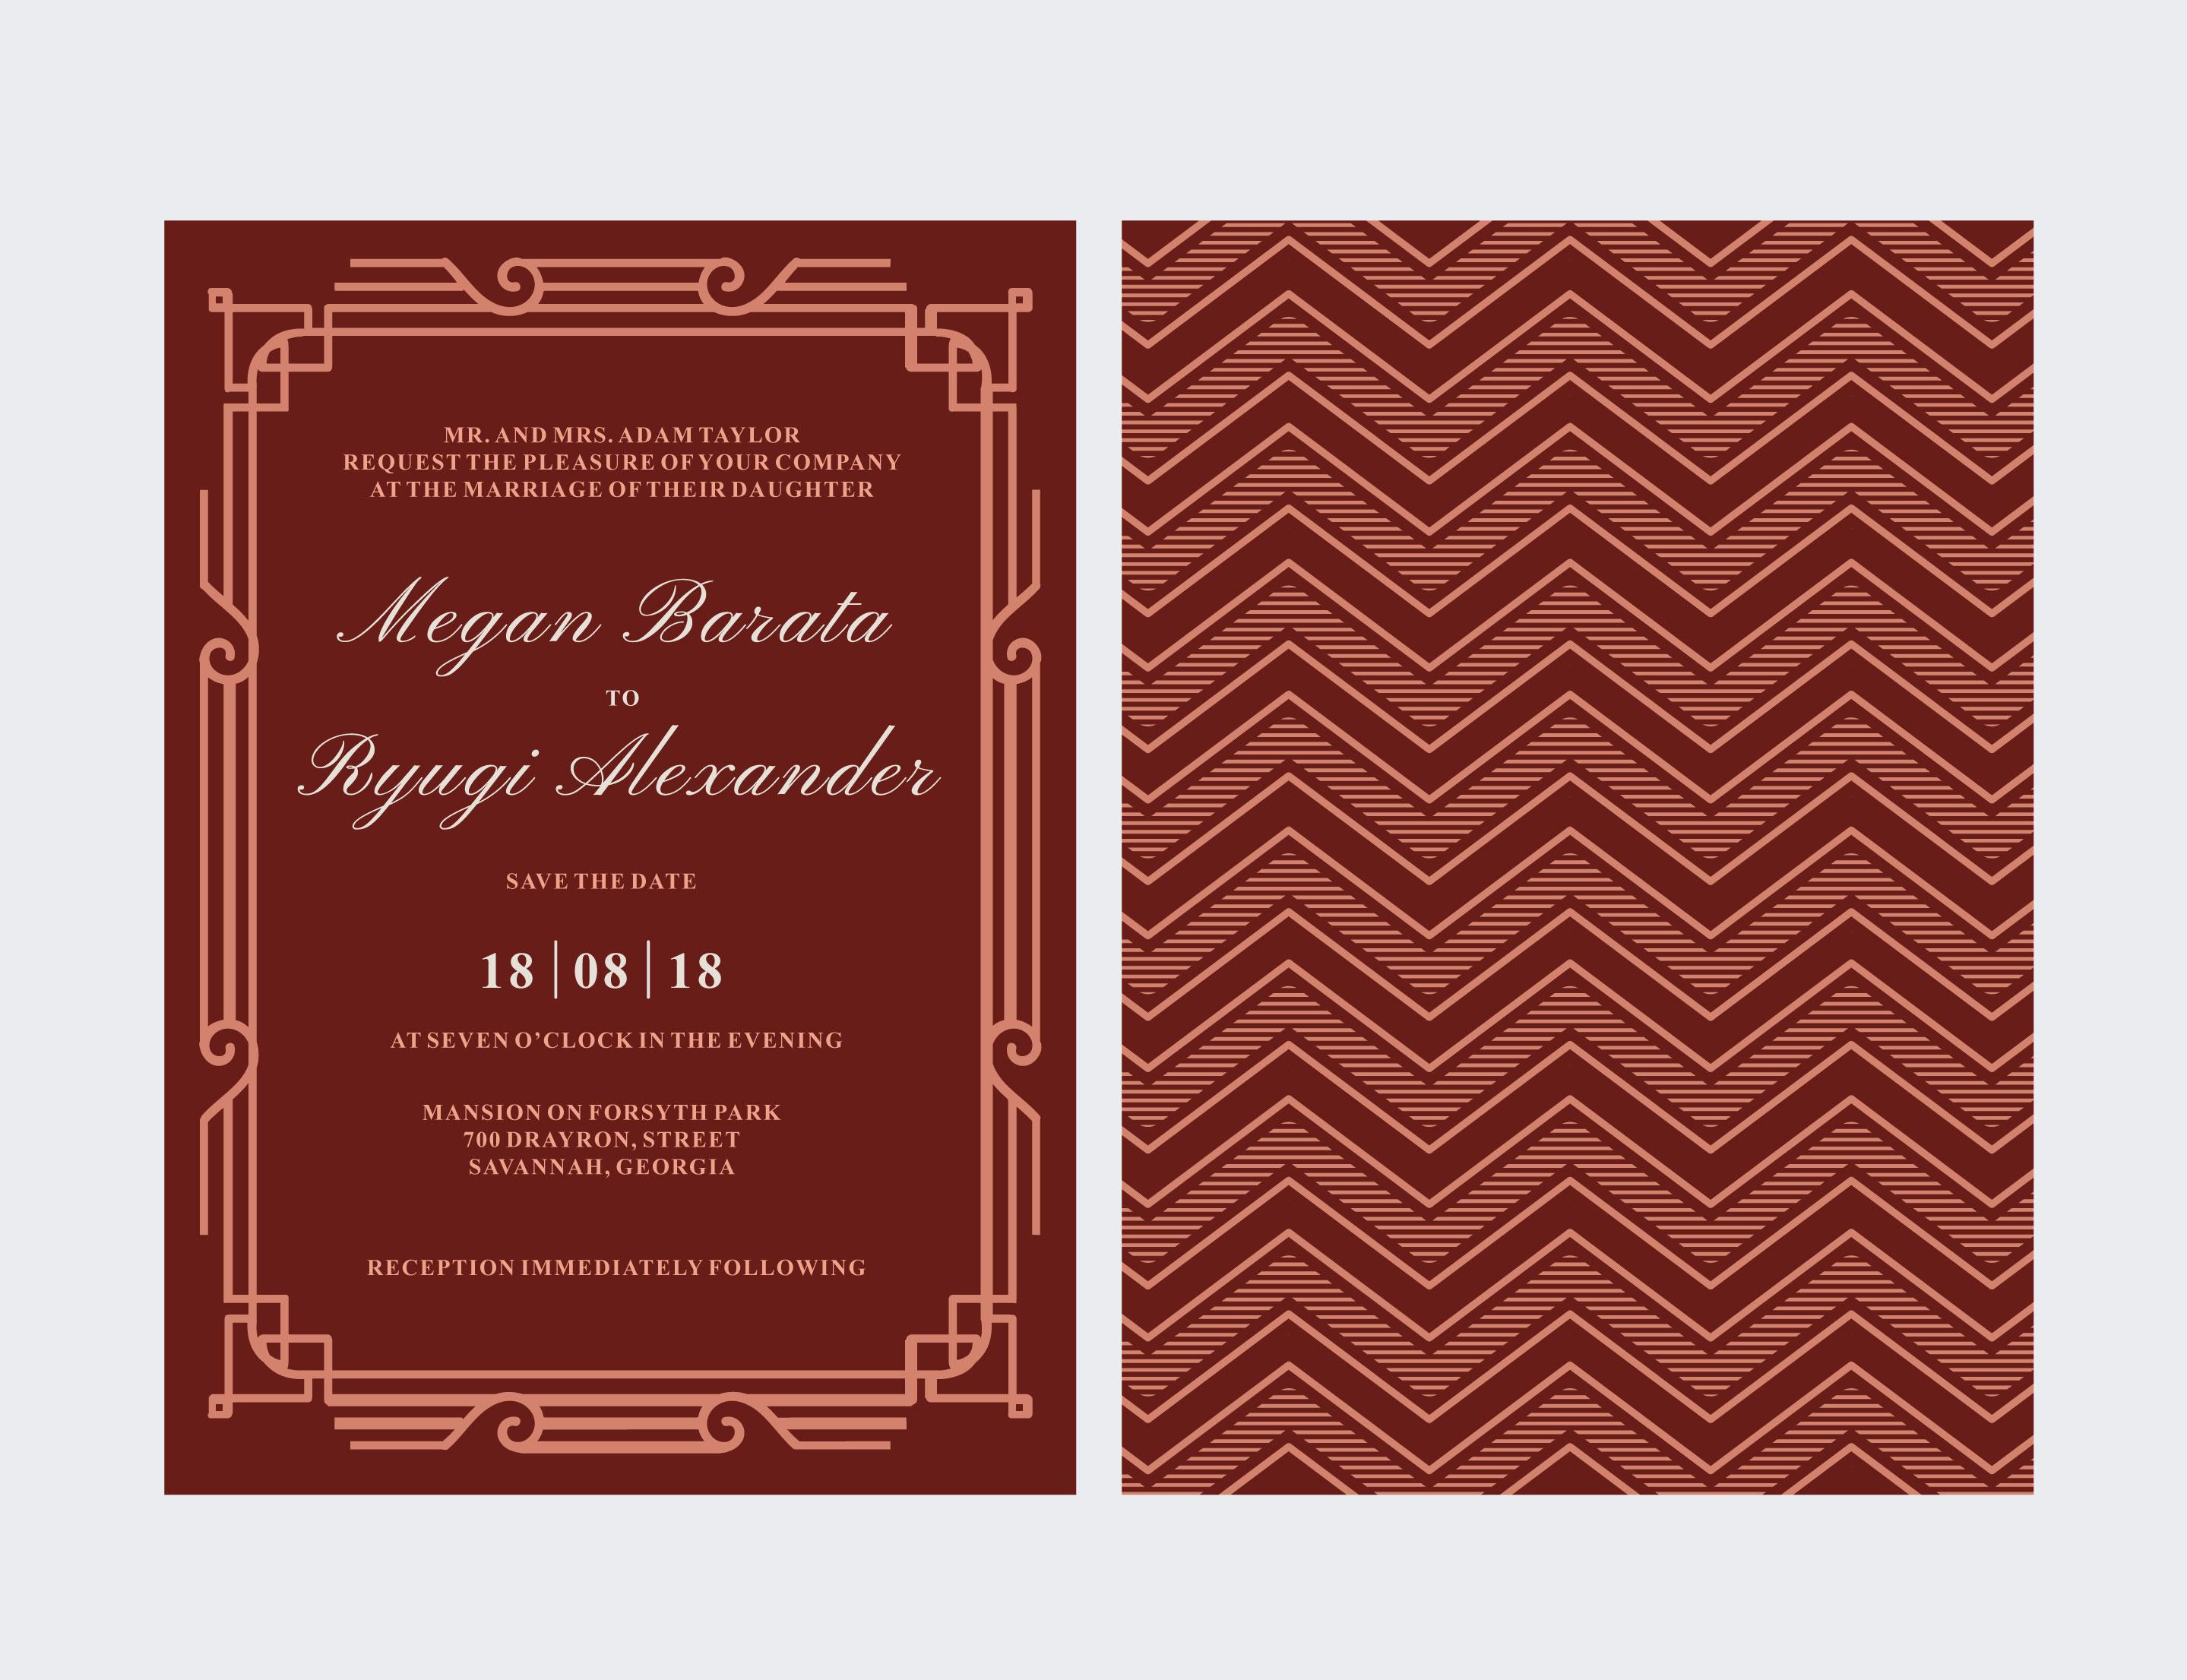 Art Deco Wedding Card - Download Free Vector Art, Stock Graphics ...